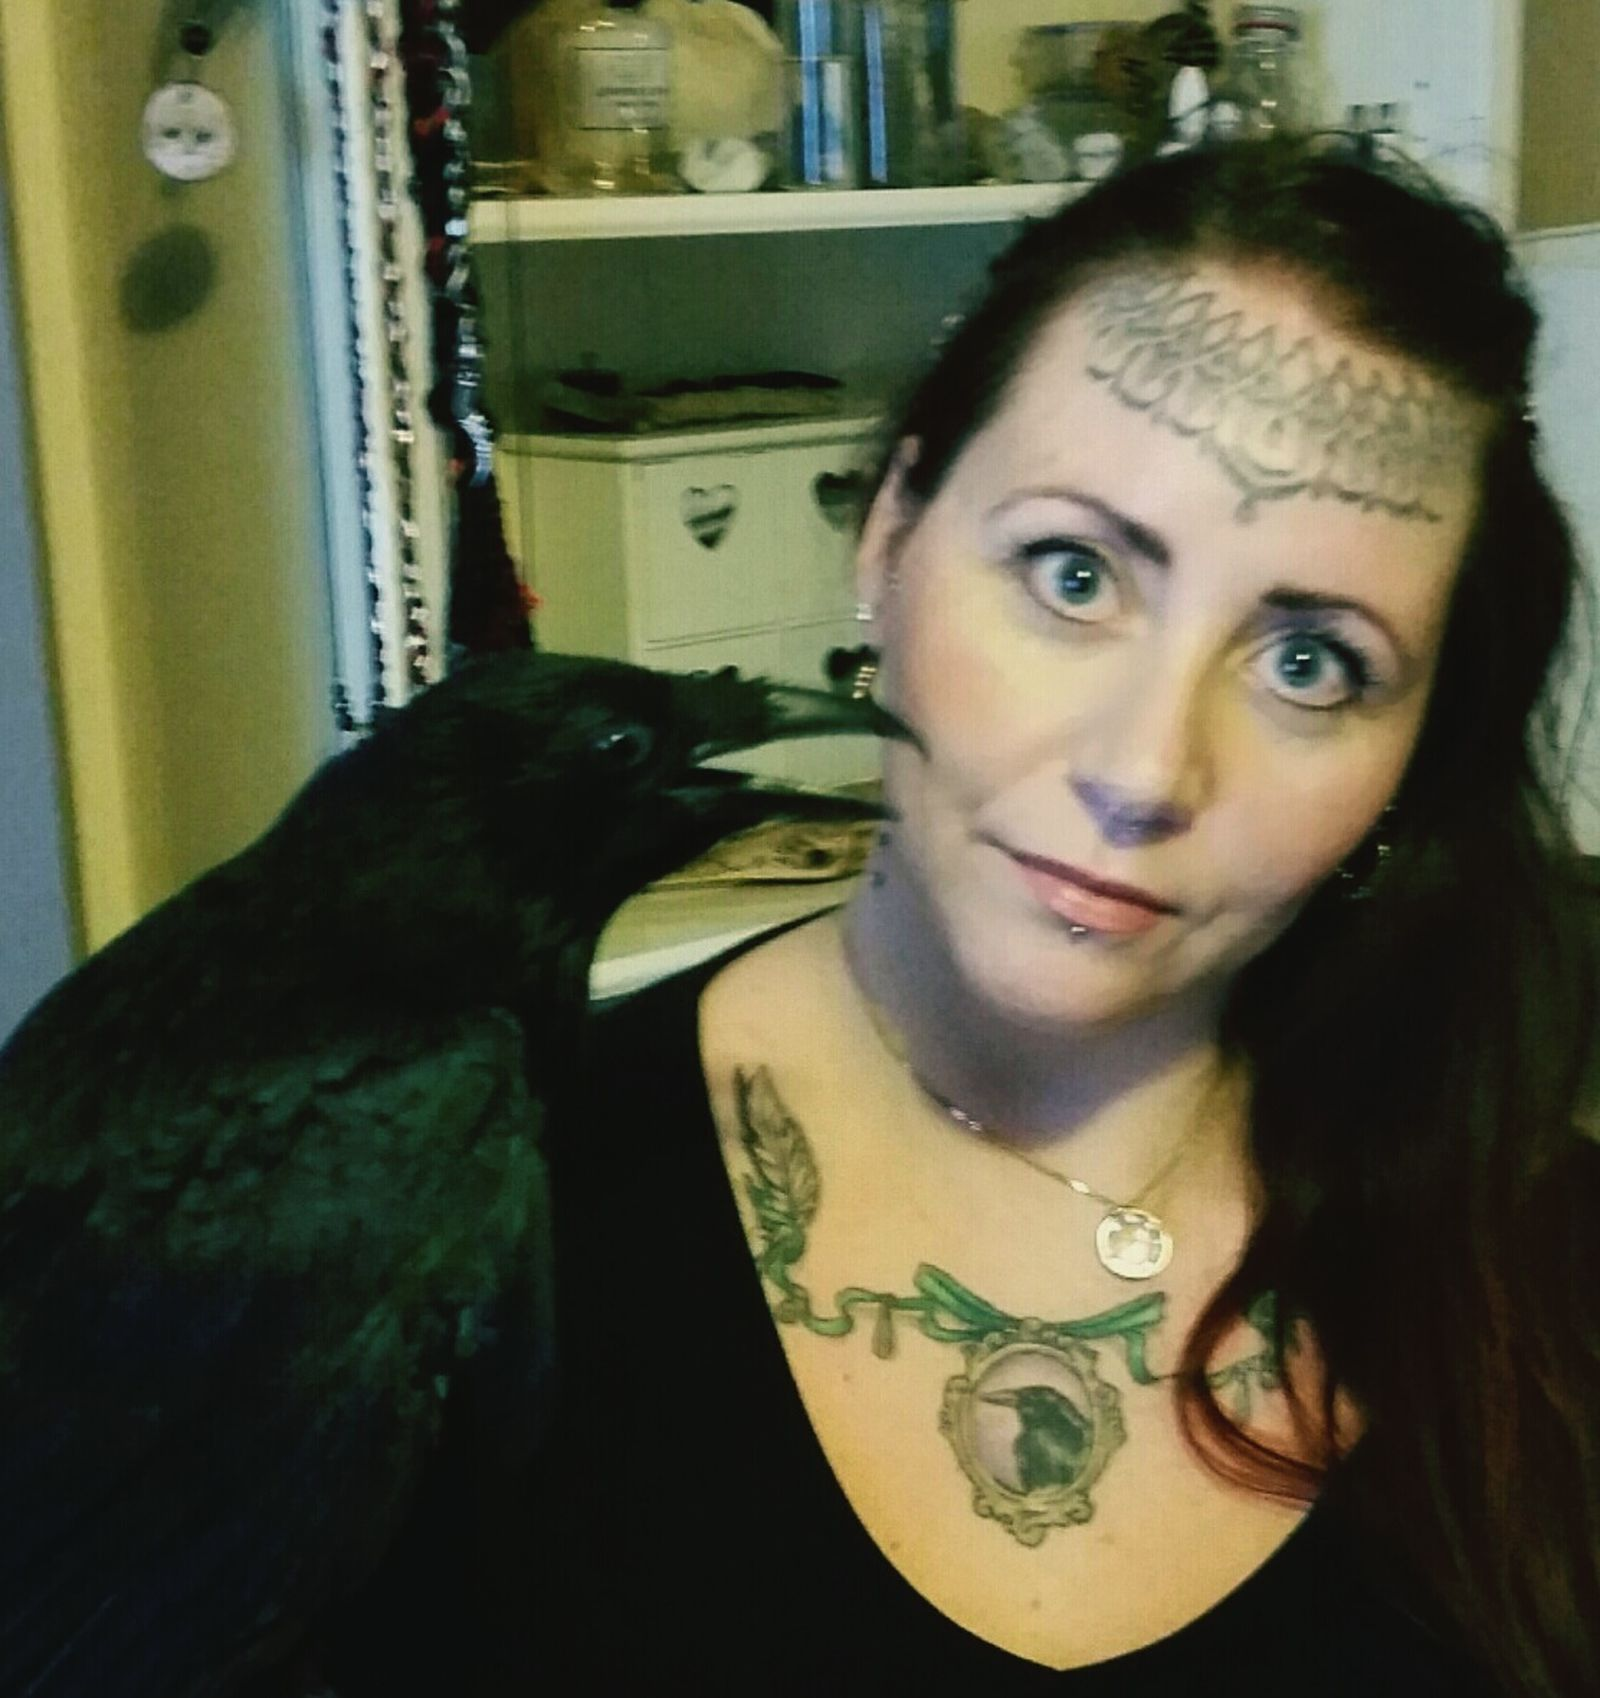 Me and Archie. :) Disabledcrow Disabled Crow Rescuecrow Love Nature Pet Petcrow Corvid Selfie